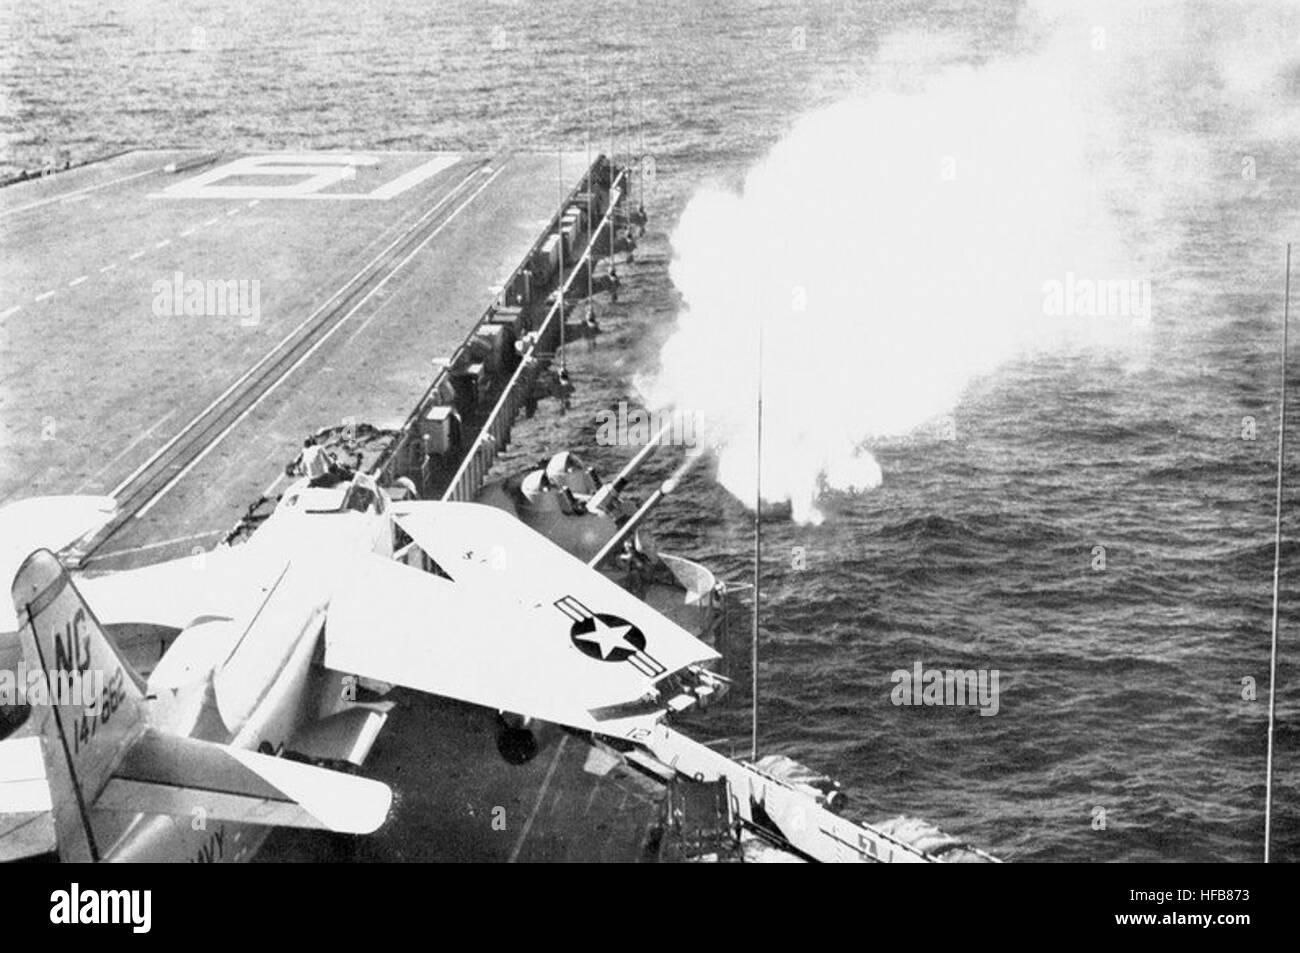 Porte-avions US - Page 10 127-mm-guns-aboard-uss-ranger-cva-61-firing-c1961-HFB873